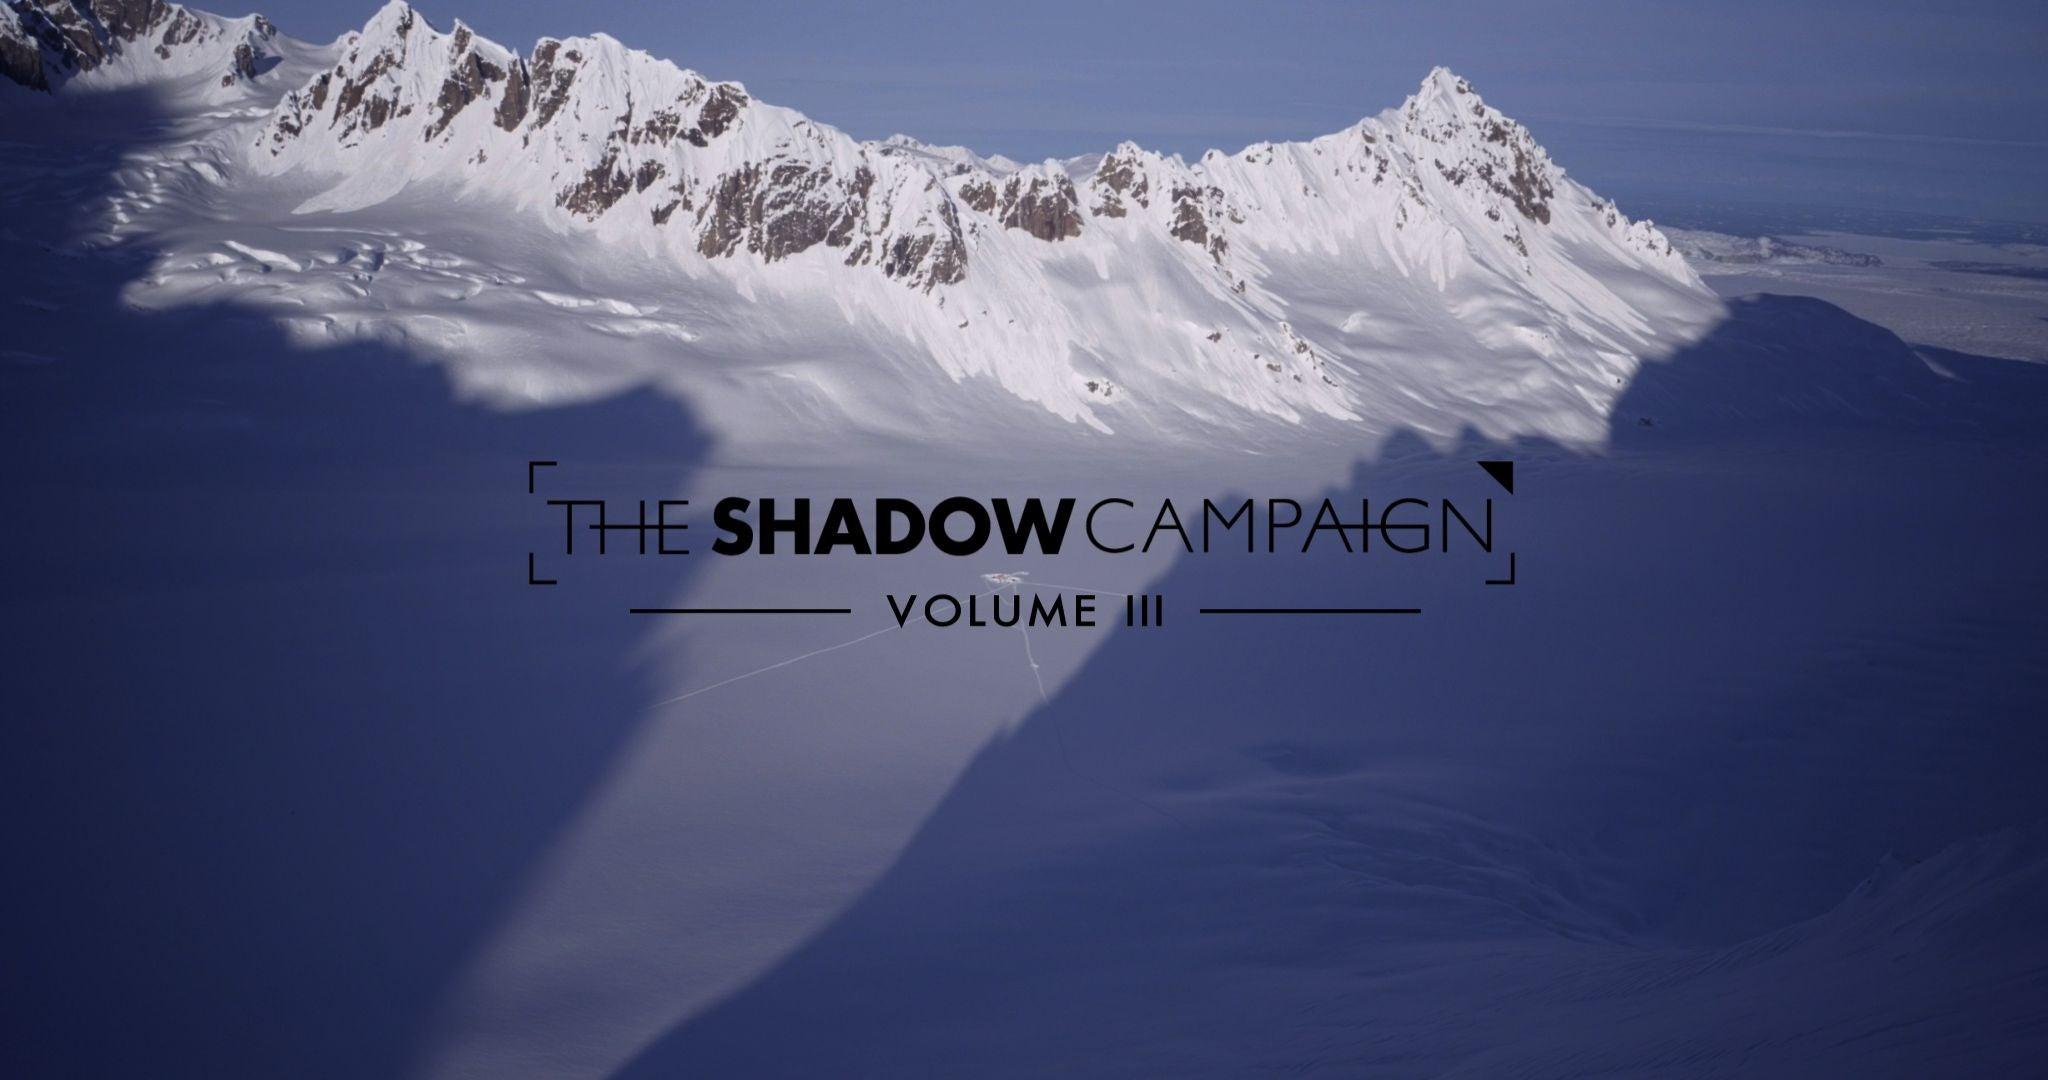 The Shadow Campaign: Volume III Trailer